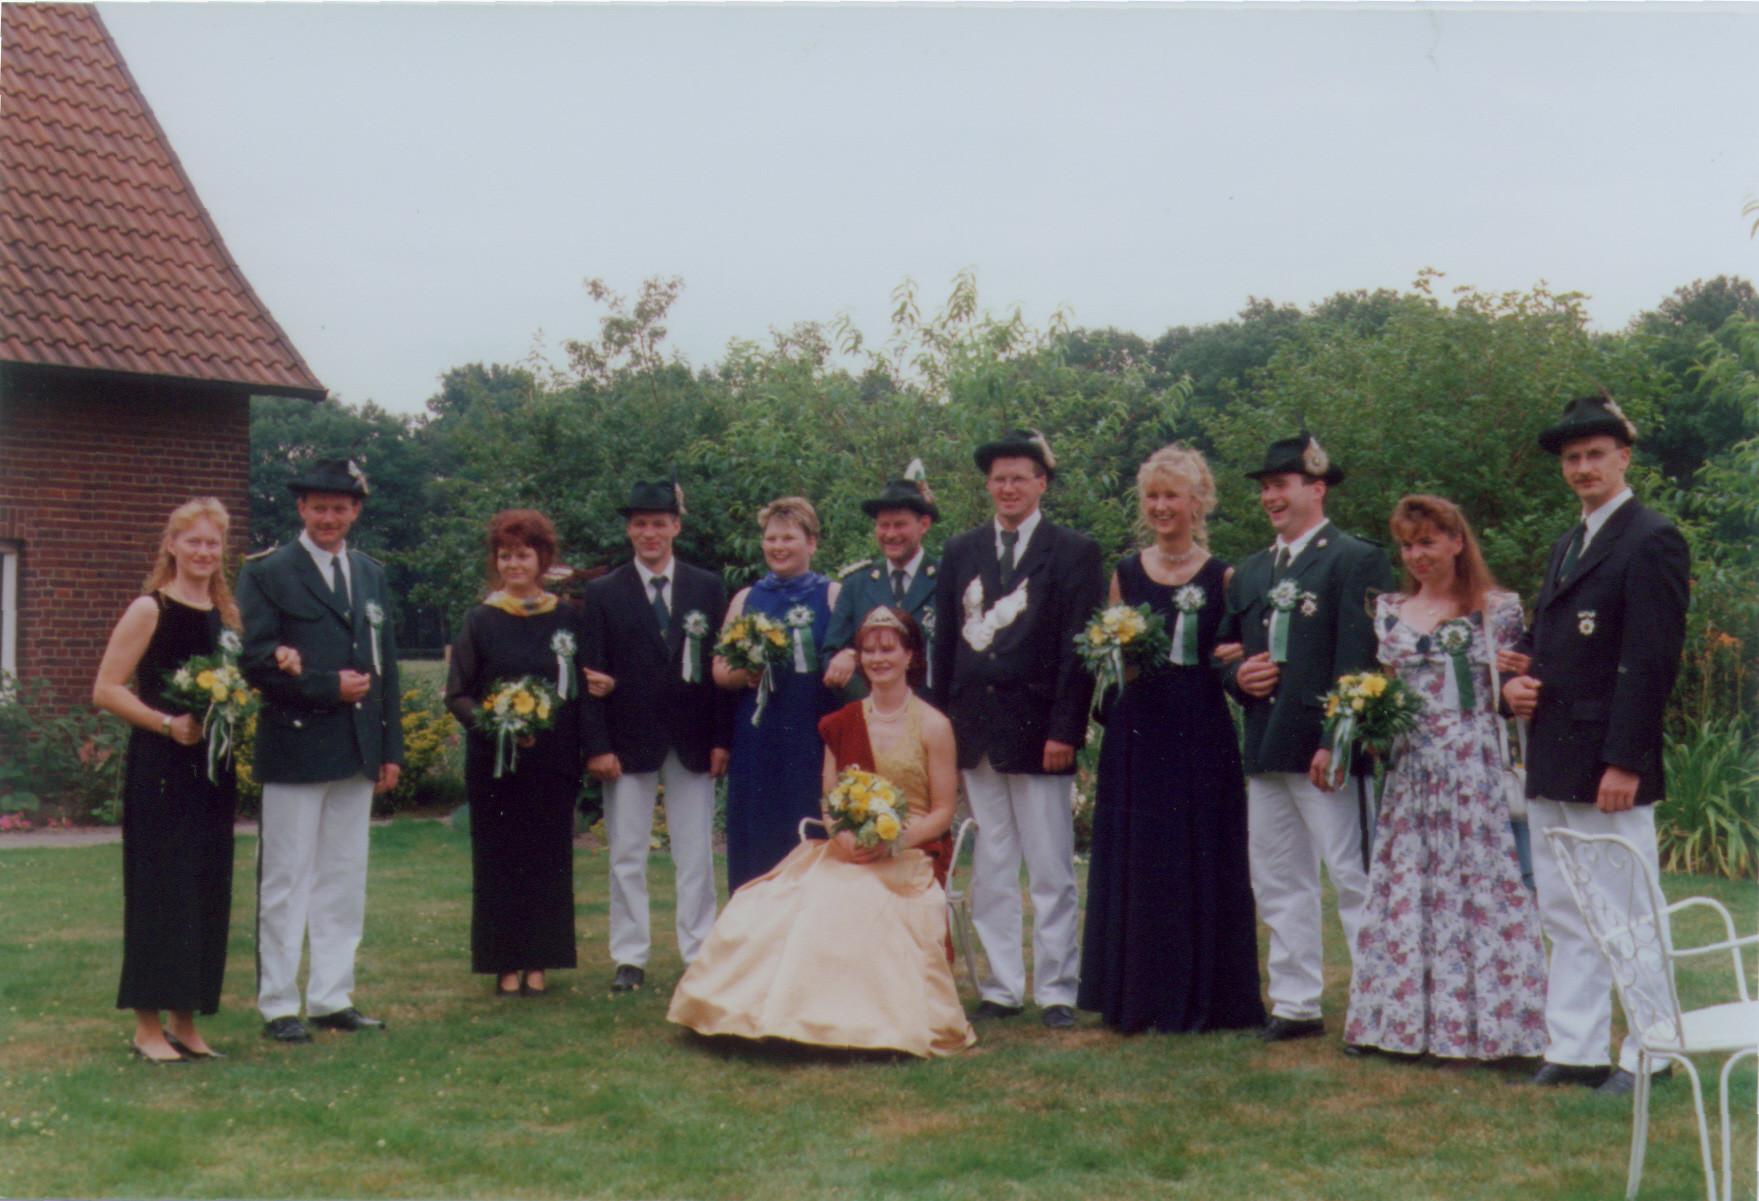 1998: König Hubert Isernhinke und Königin Hedwig Isernhinke